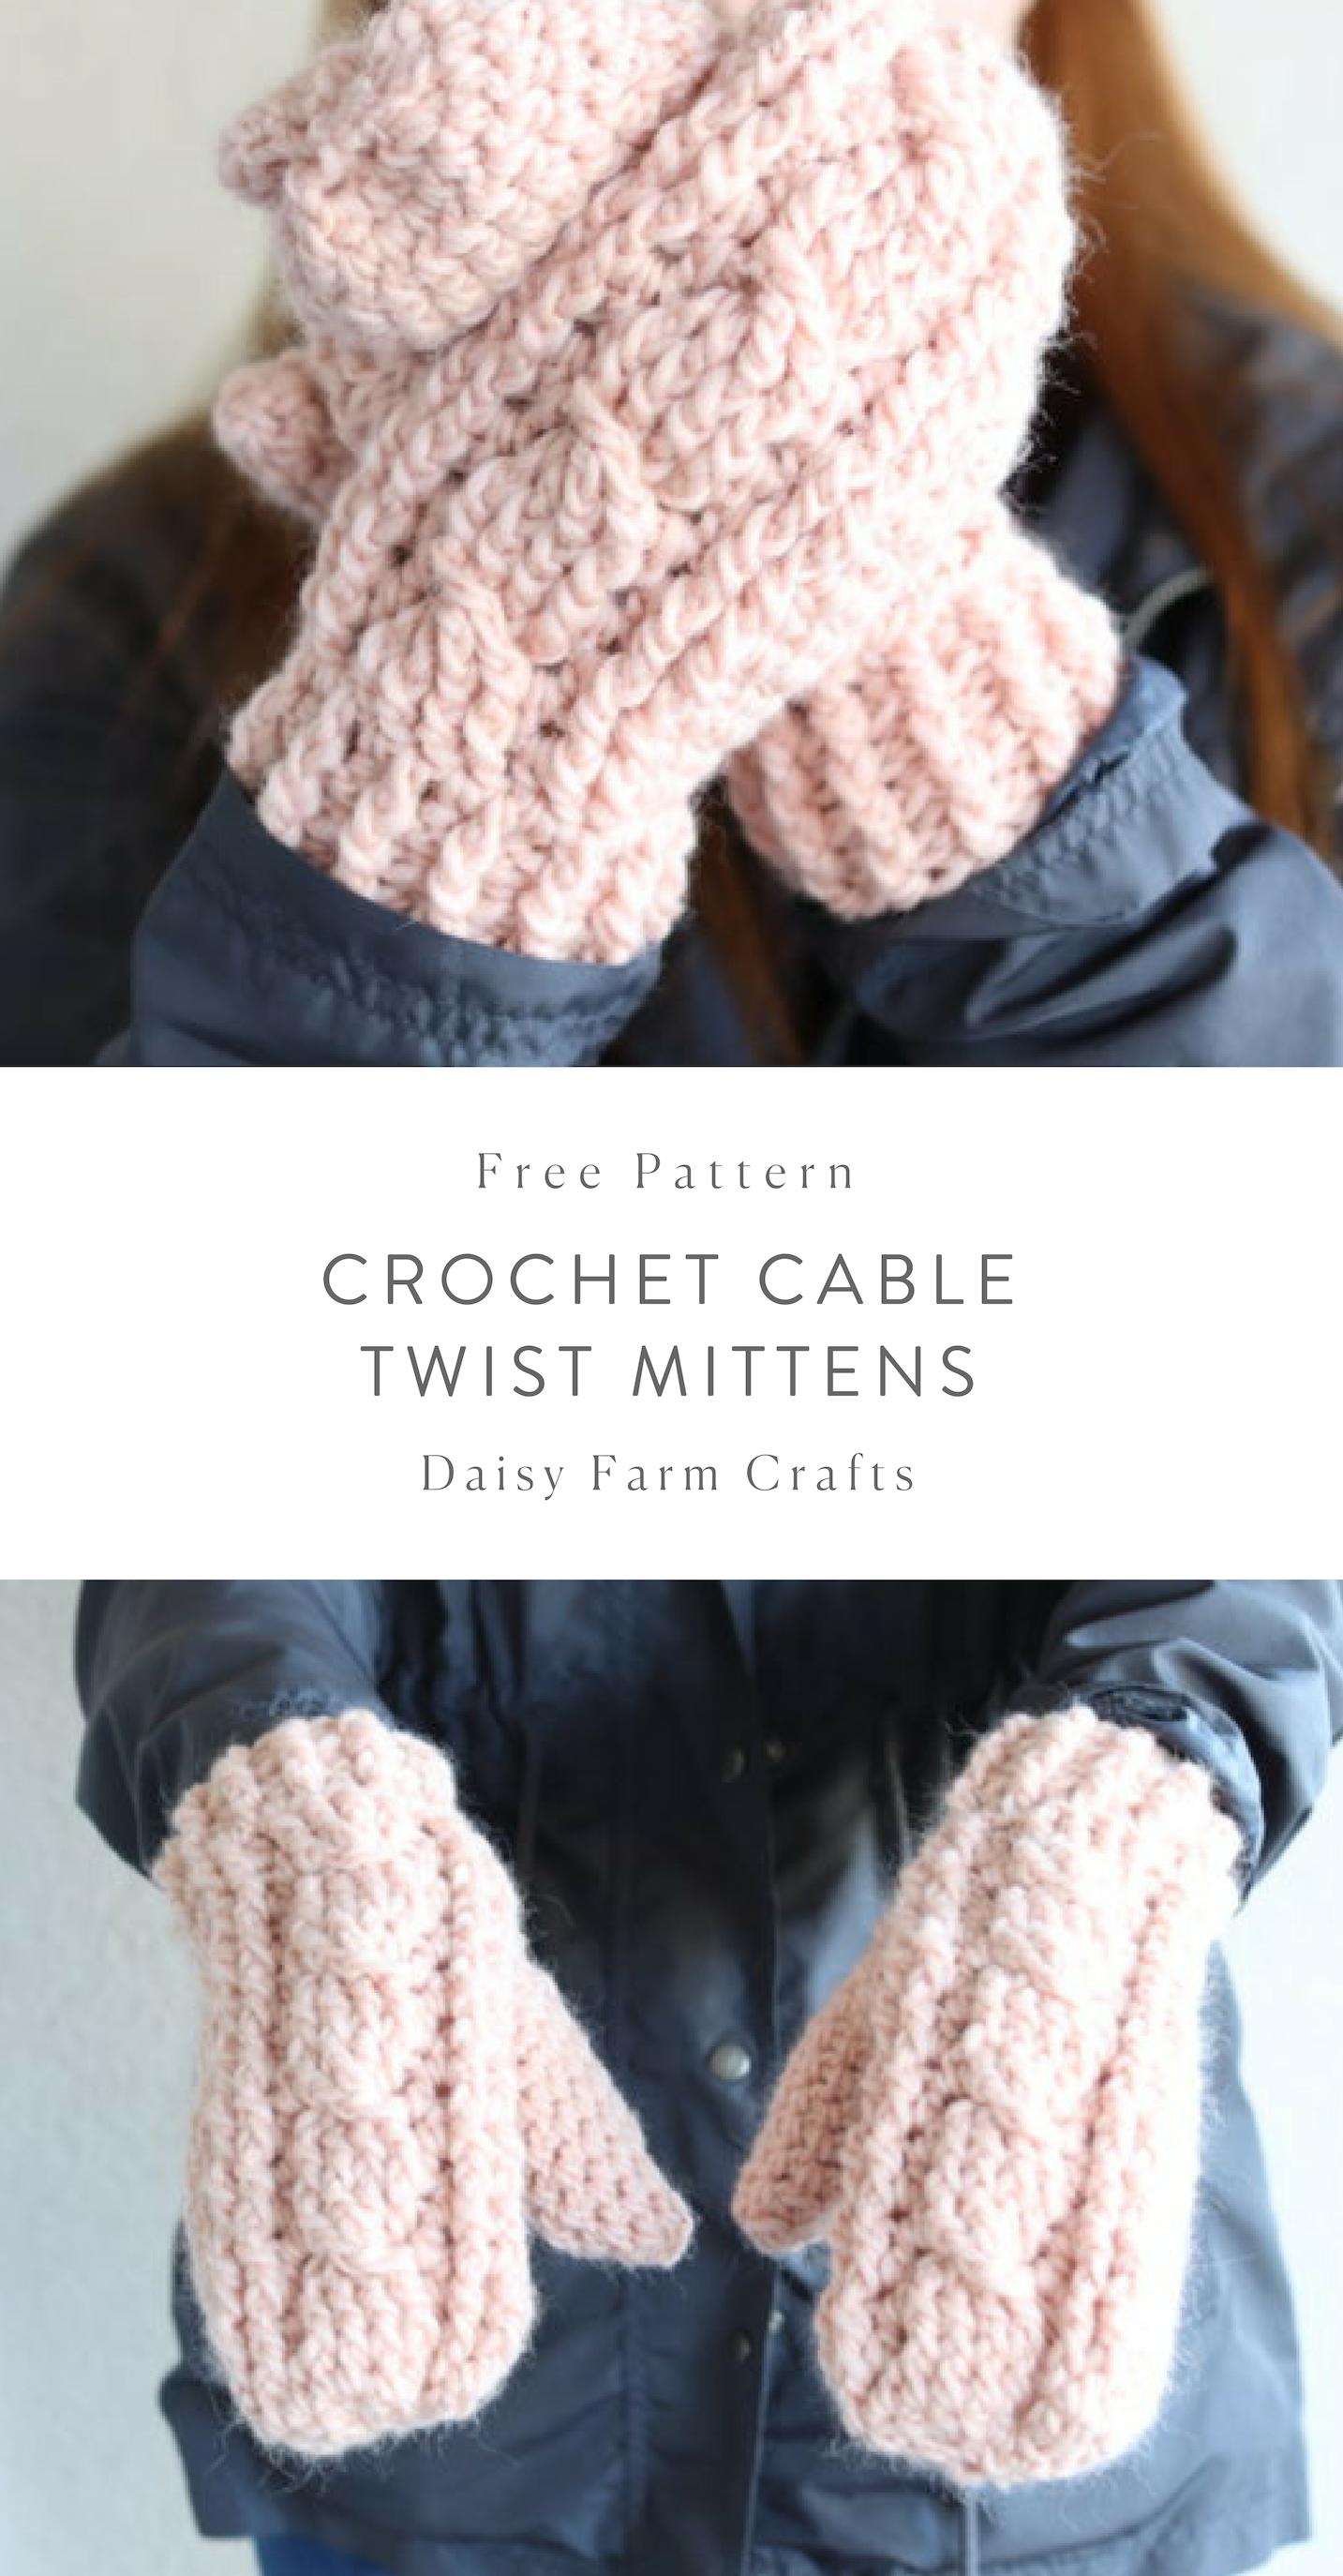 Daisy Farm Crafts Crochet Cable Crochet Mitts Crochet Mittens